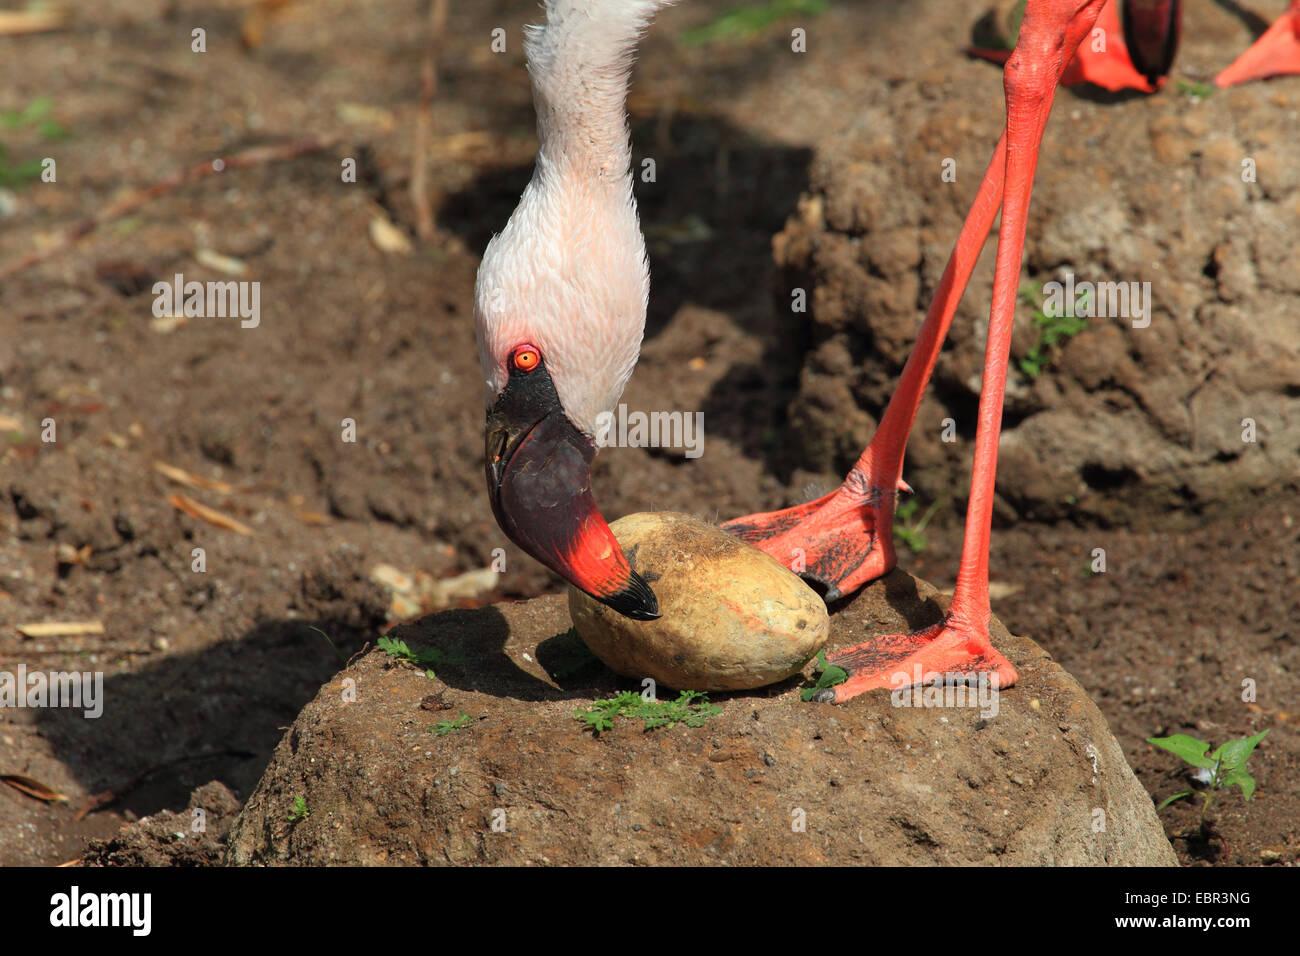 Flamingo nest - photo#55